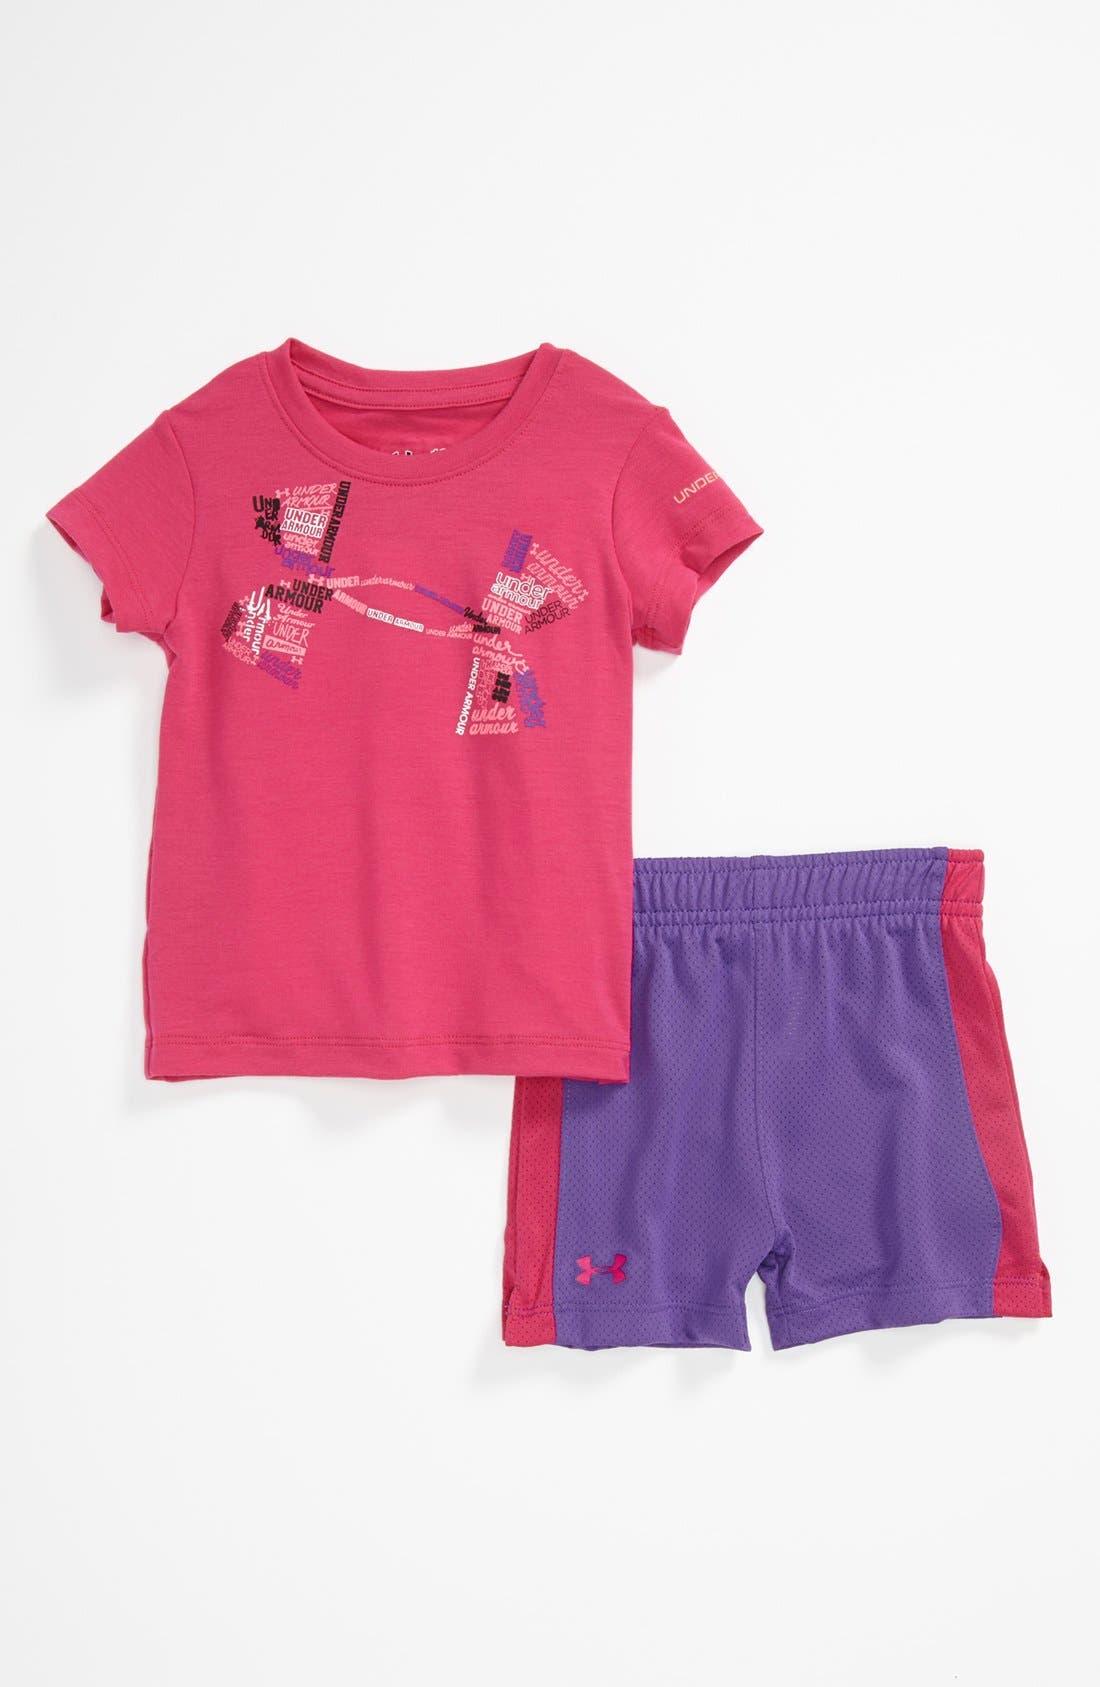 Main Image - Under Armour T-Shirt & Shorts (Baby Girls)